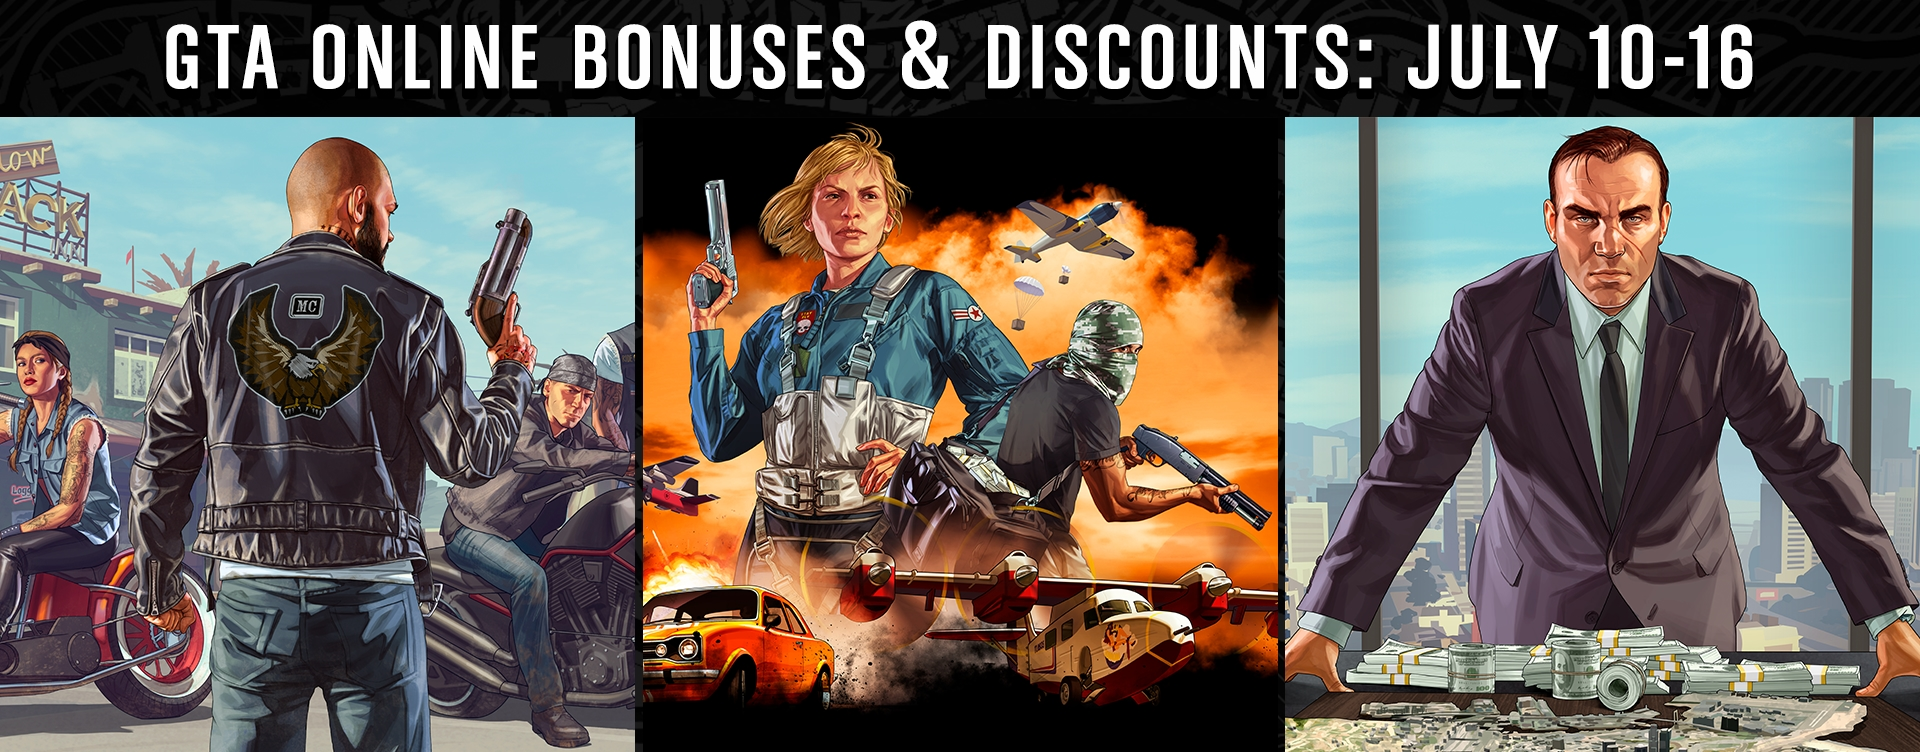 GTA Online Bonuses and Guest List Rewards - Rockstar Games